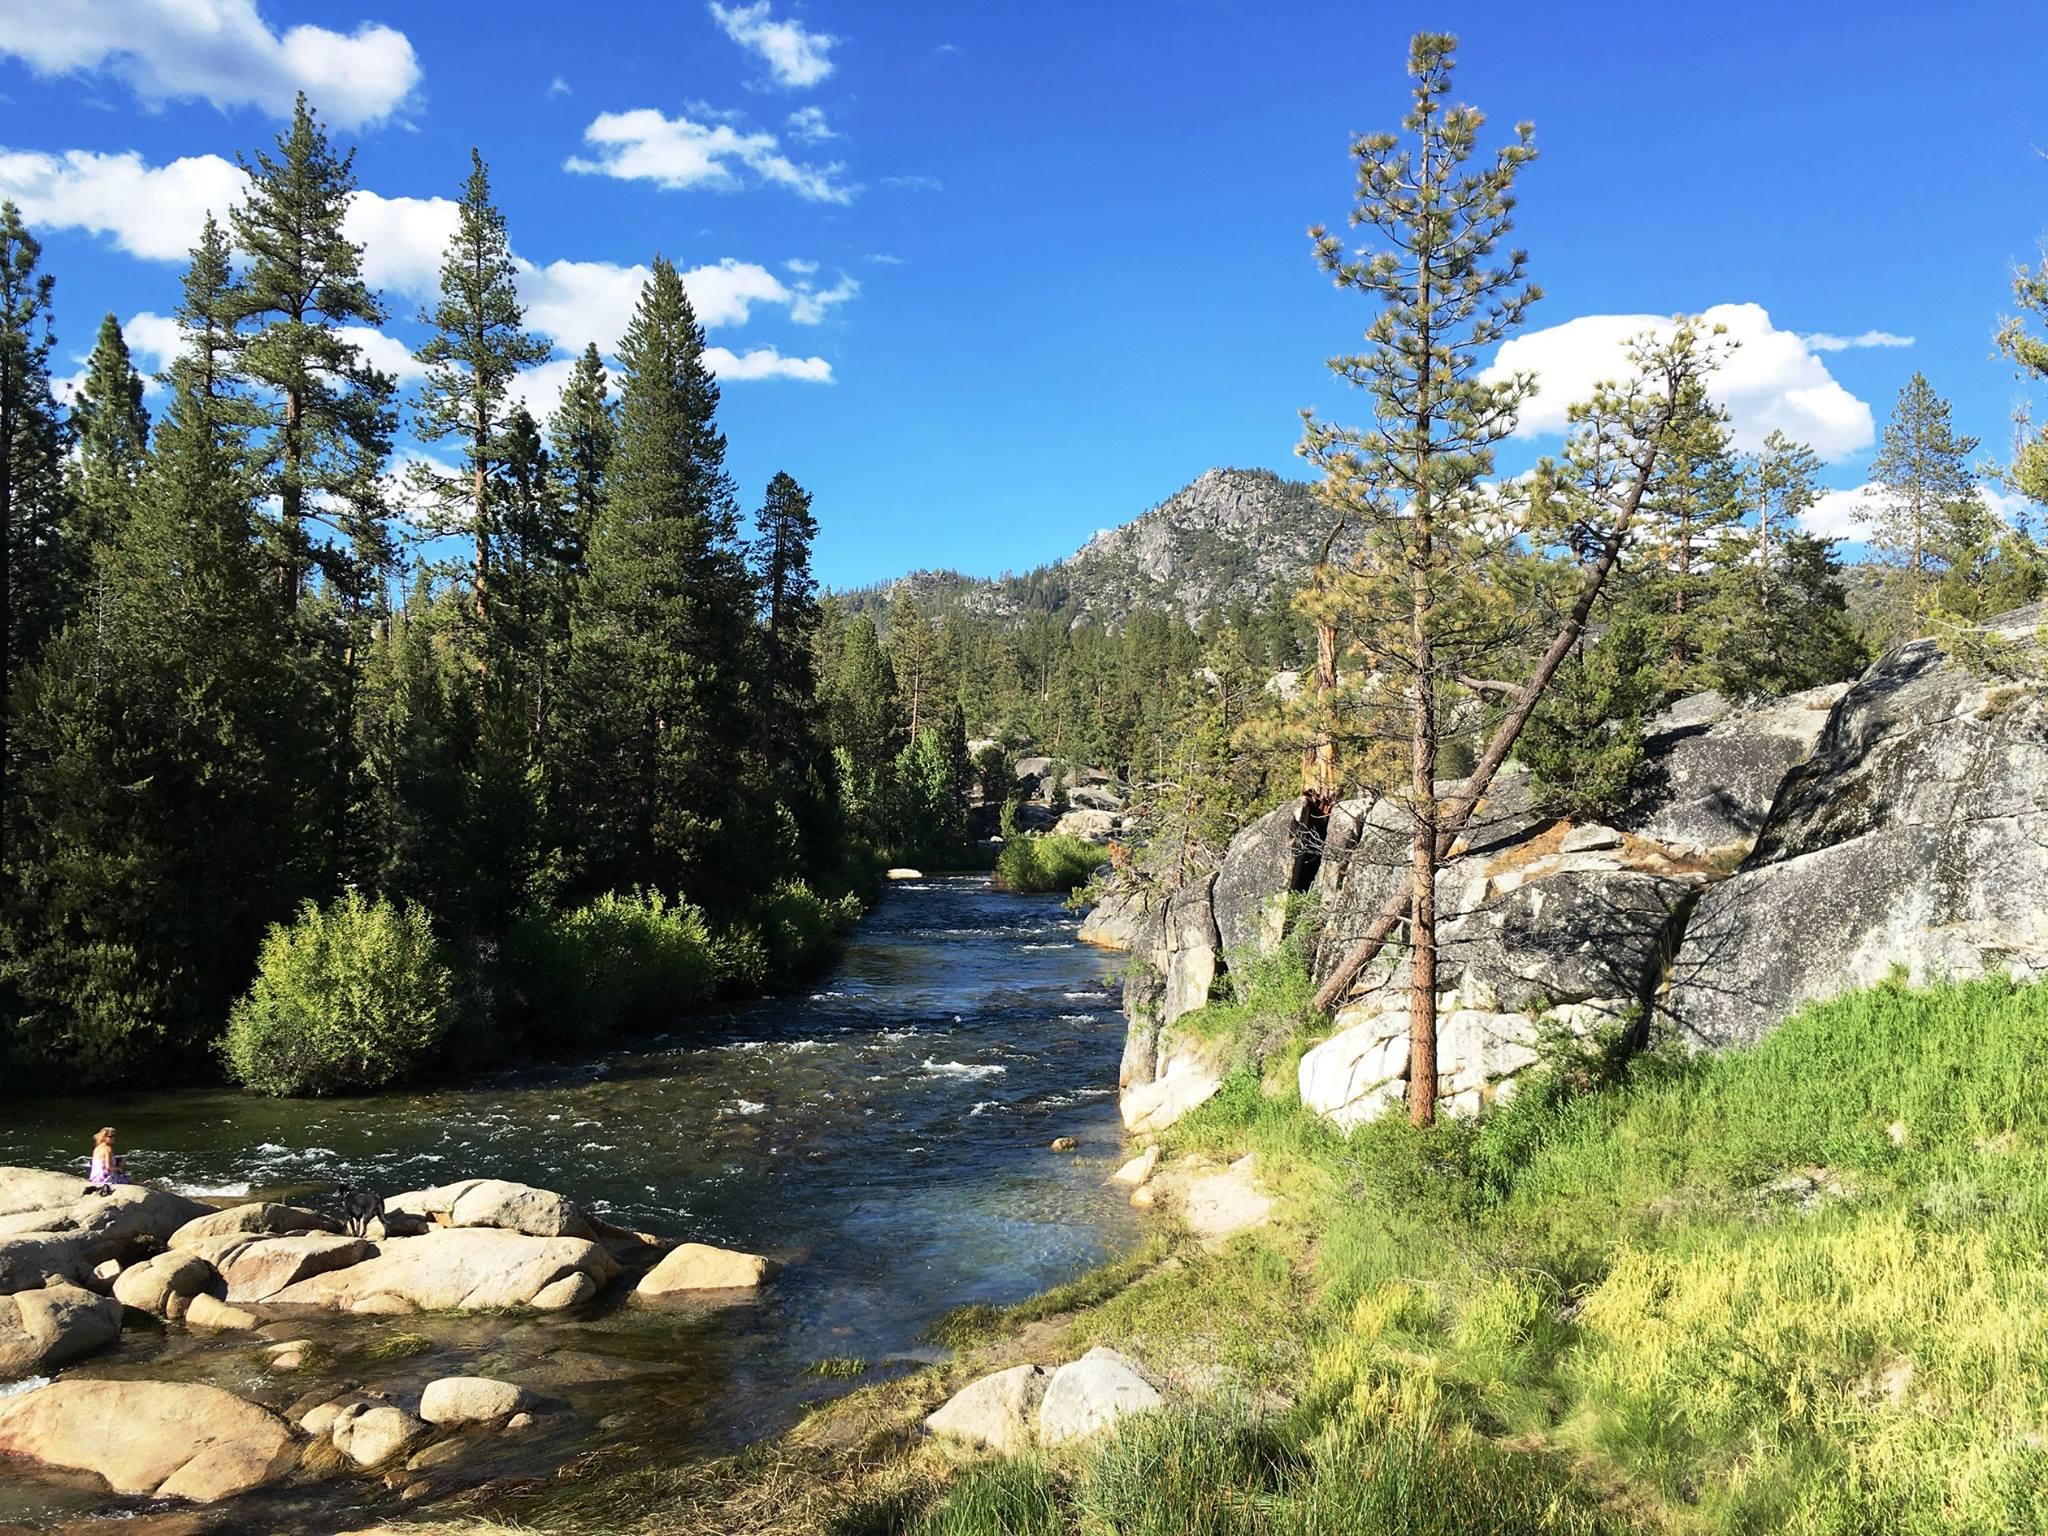 San Joaquin River in Sierra NF